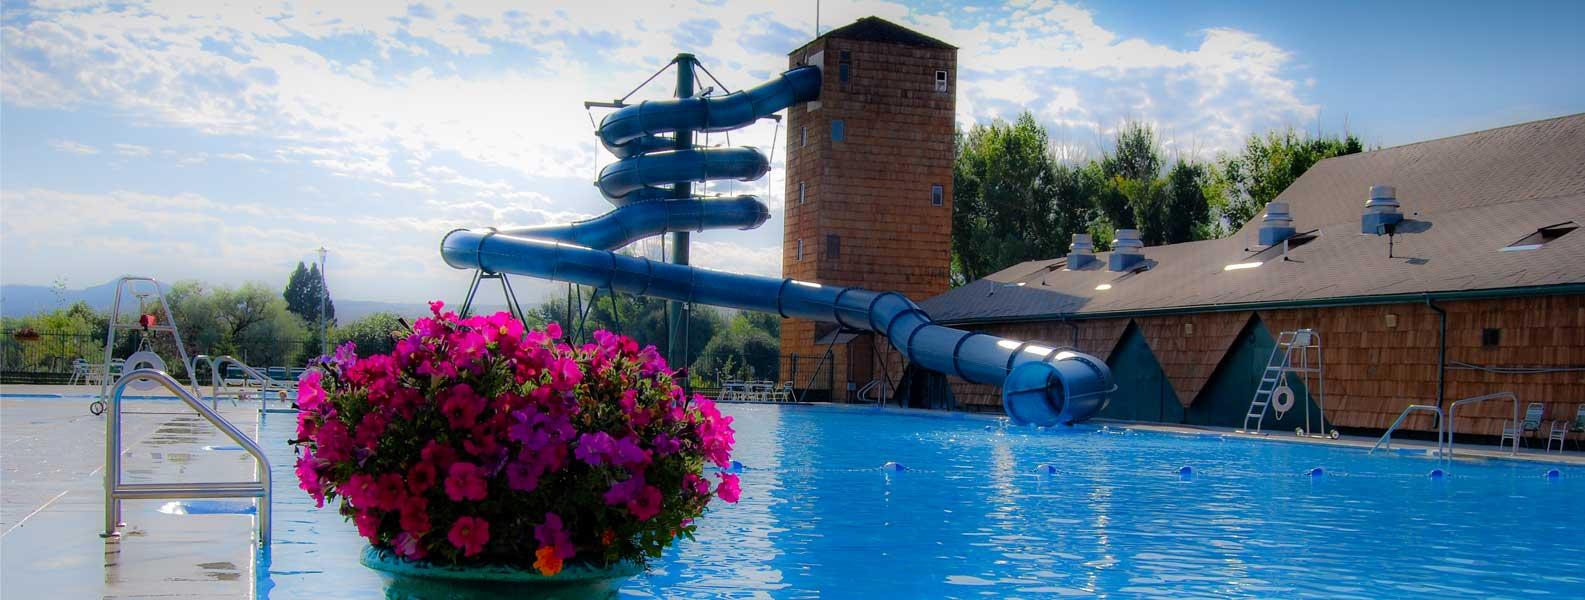 Resort Outdoor Mineral Springs Pool Indoor